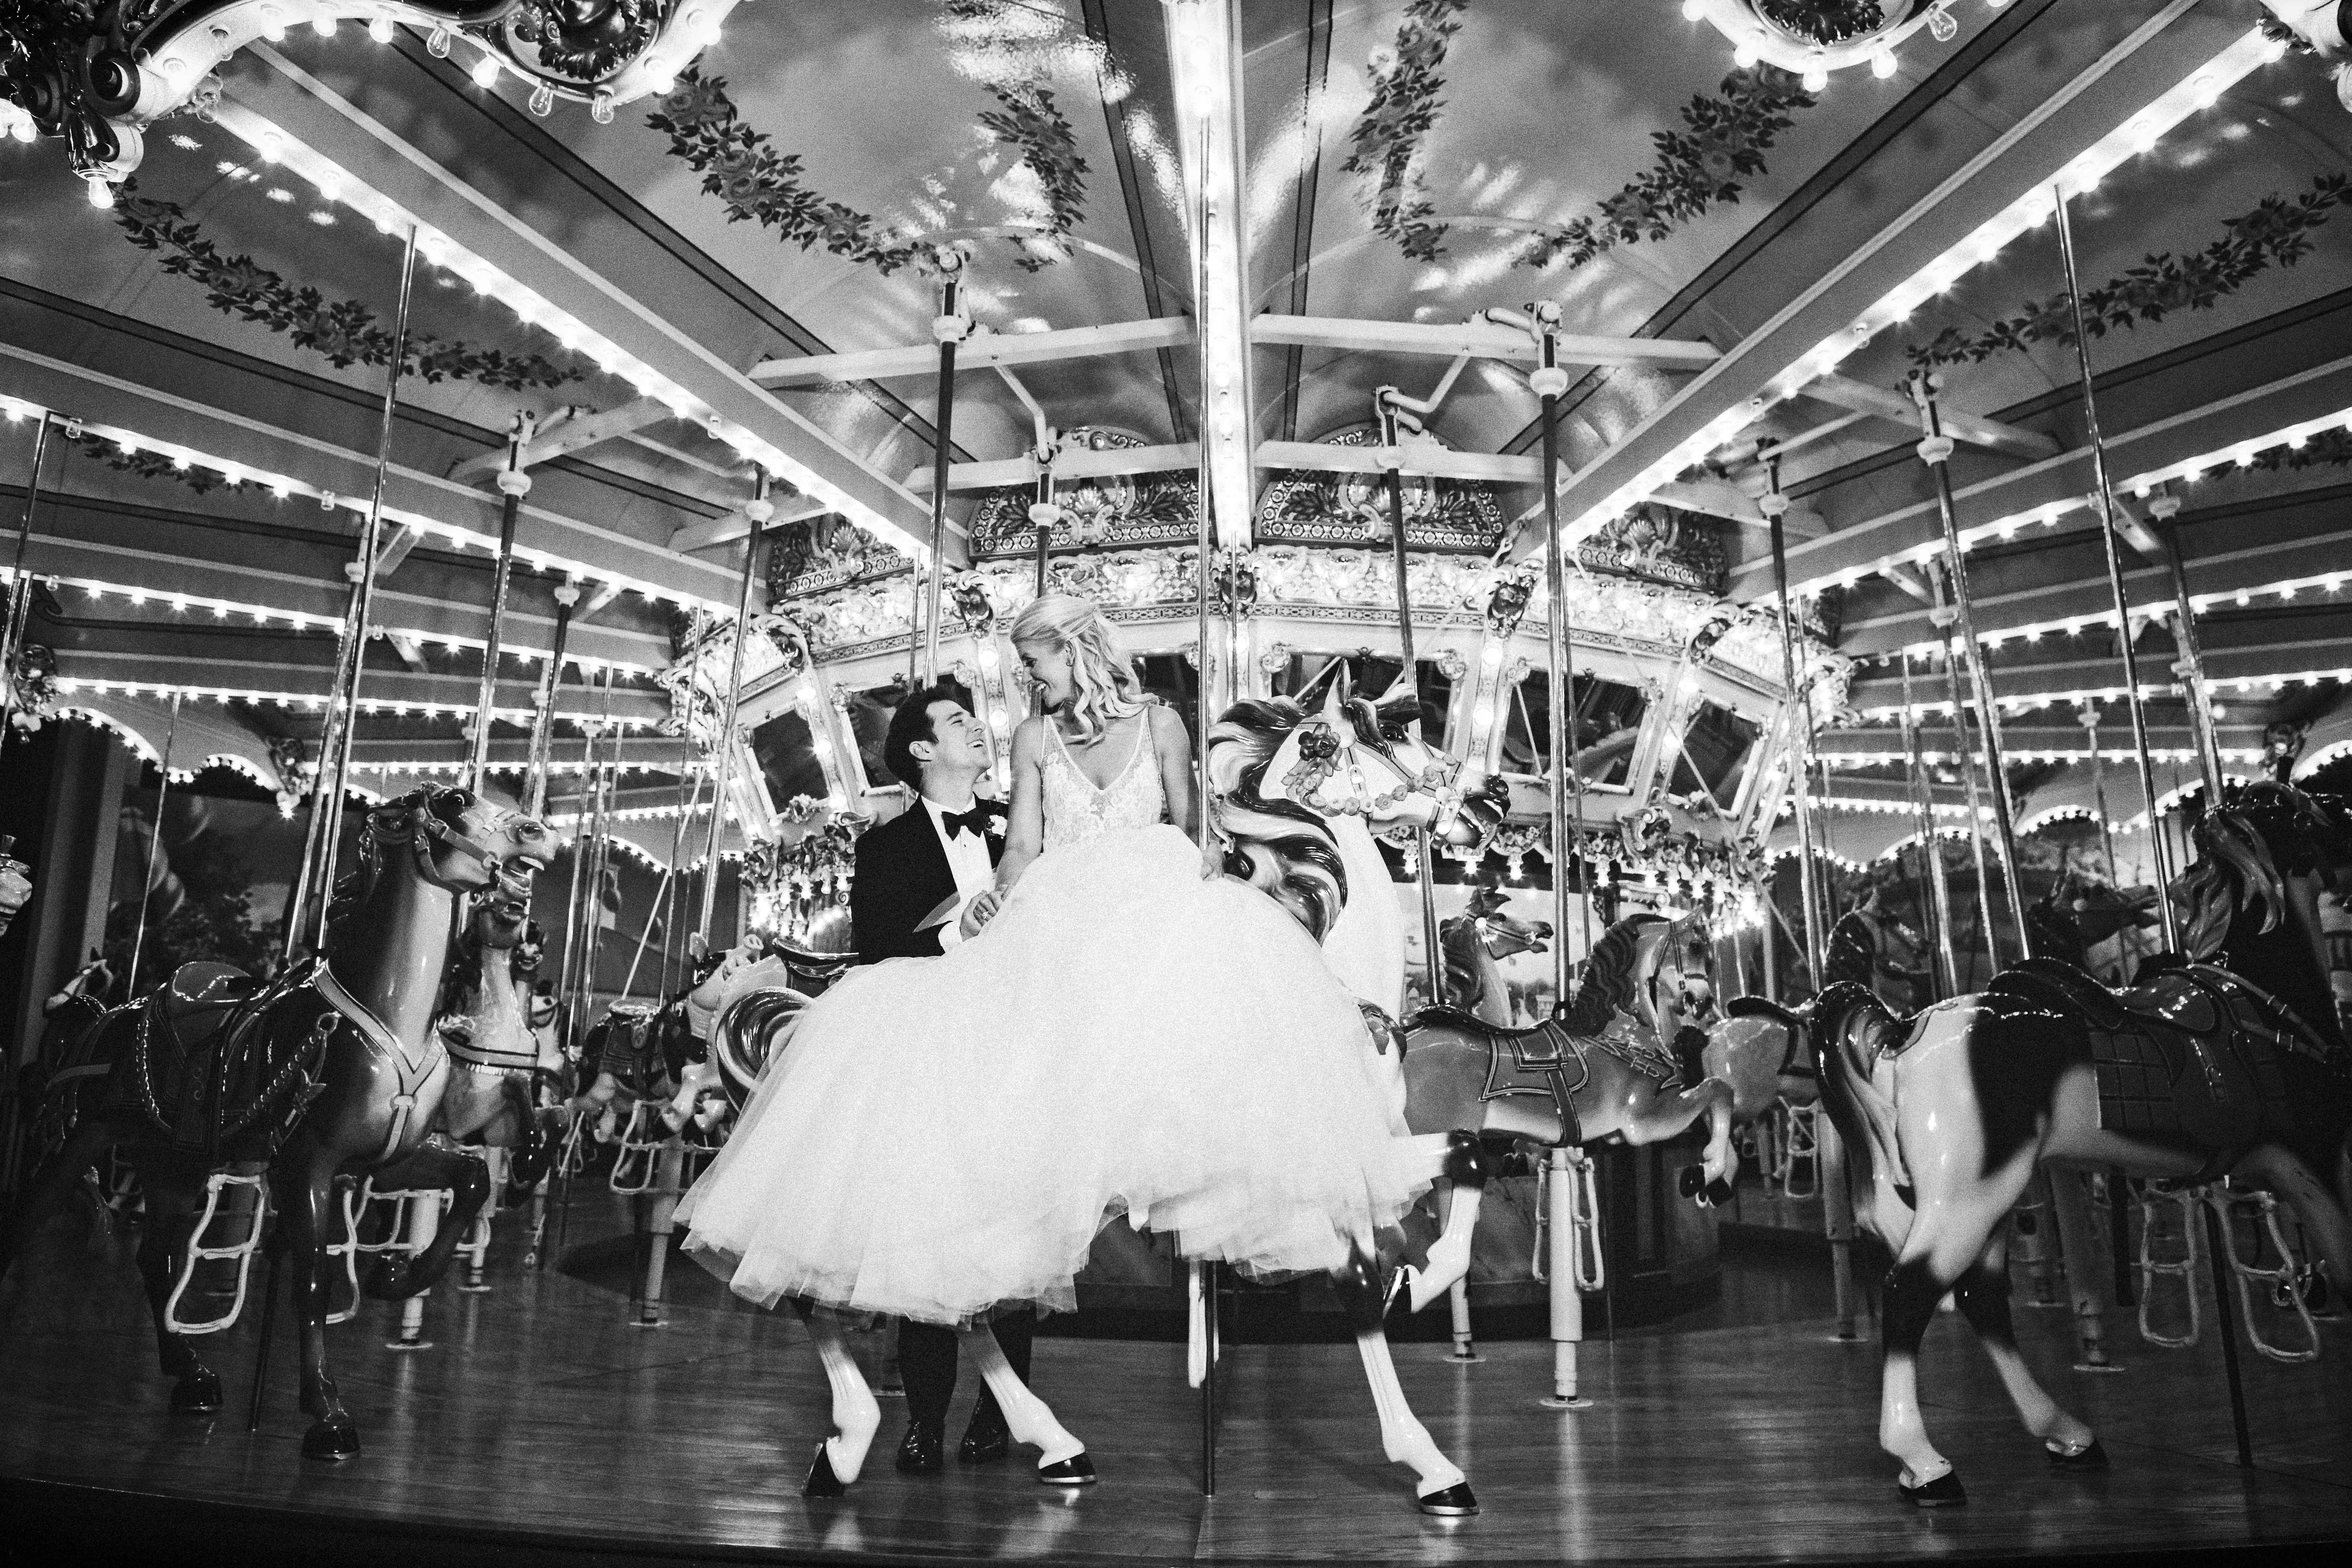 New Years Eve wedding carousel